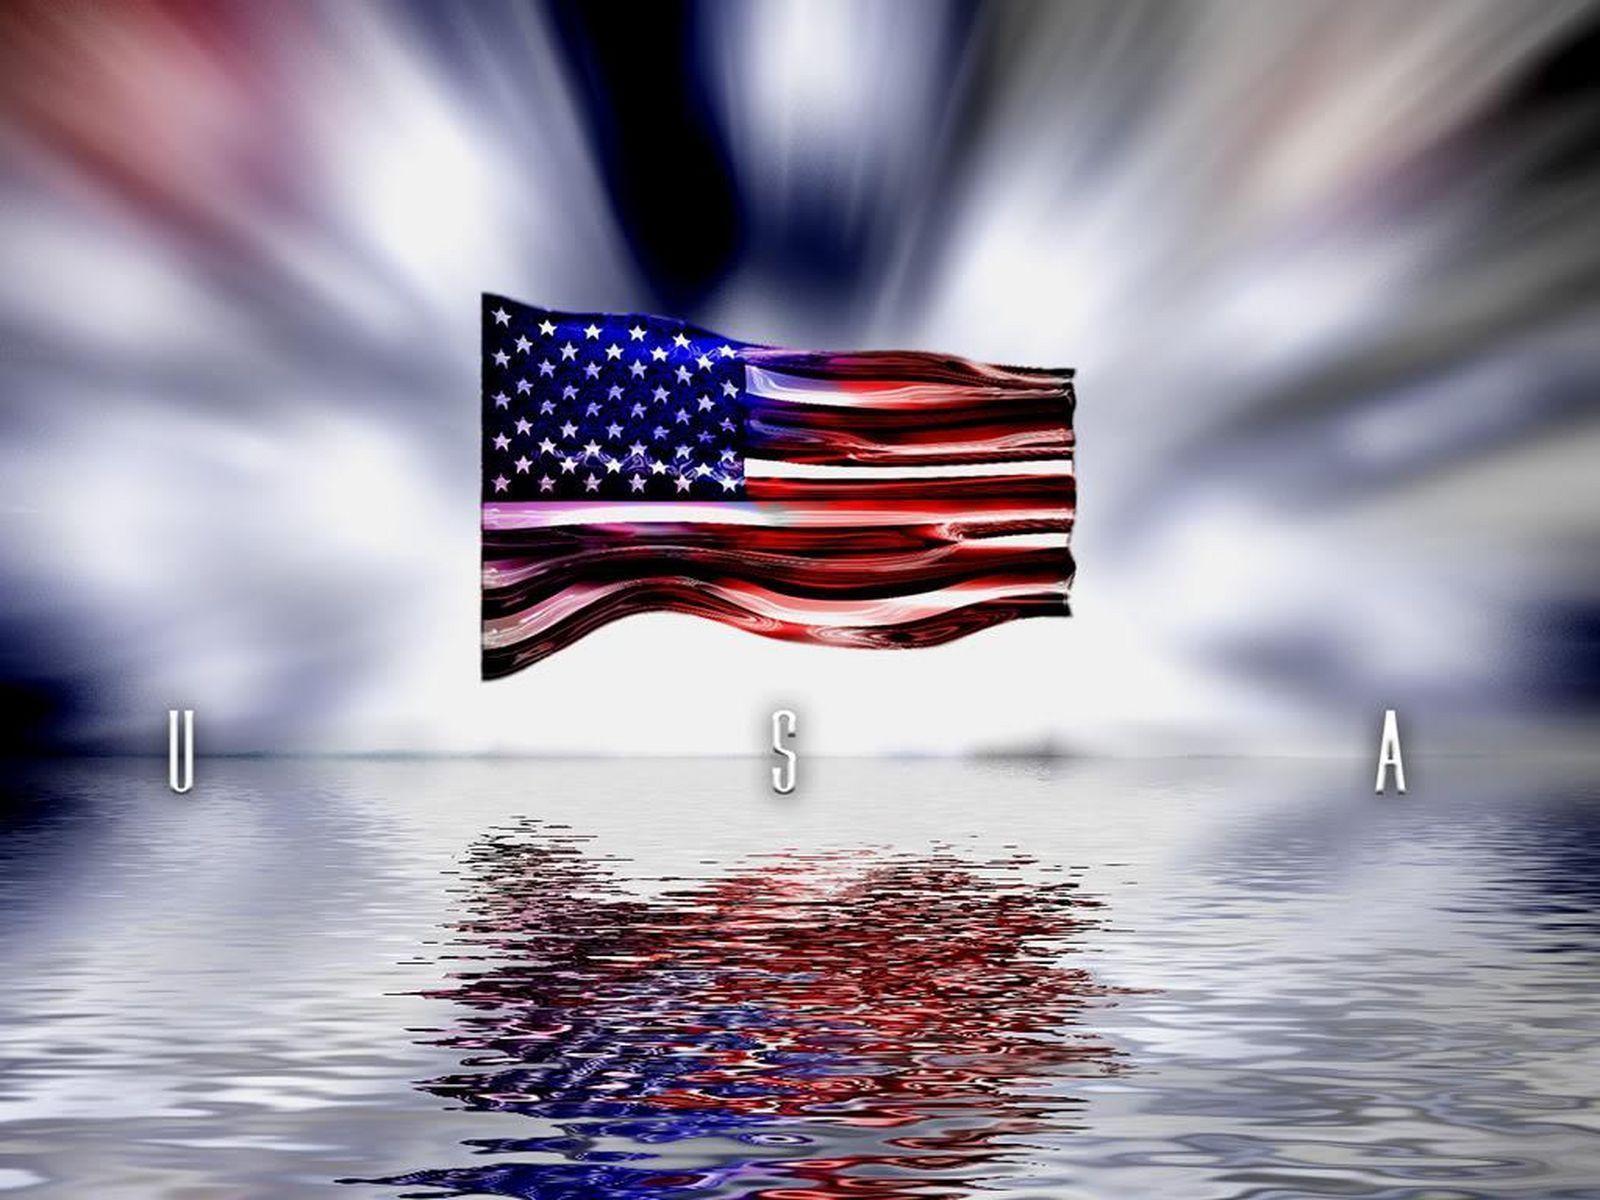 American Flag Desktop Backgrounds 1600x1200